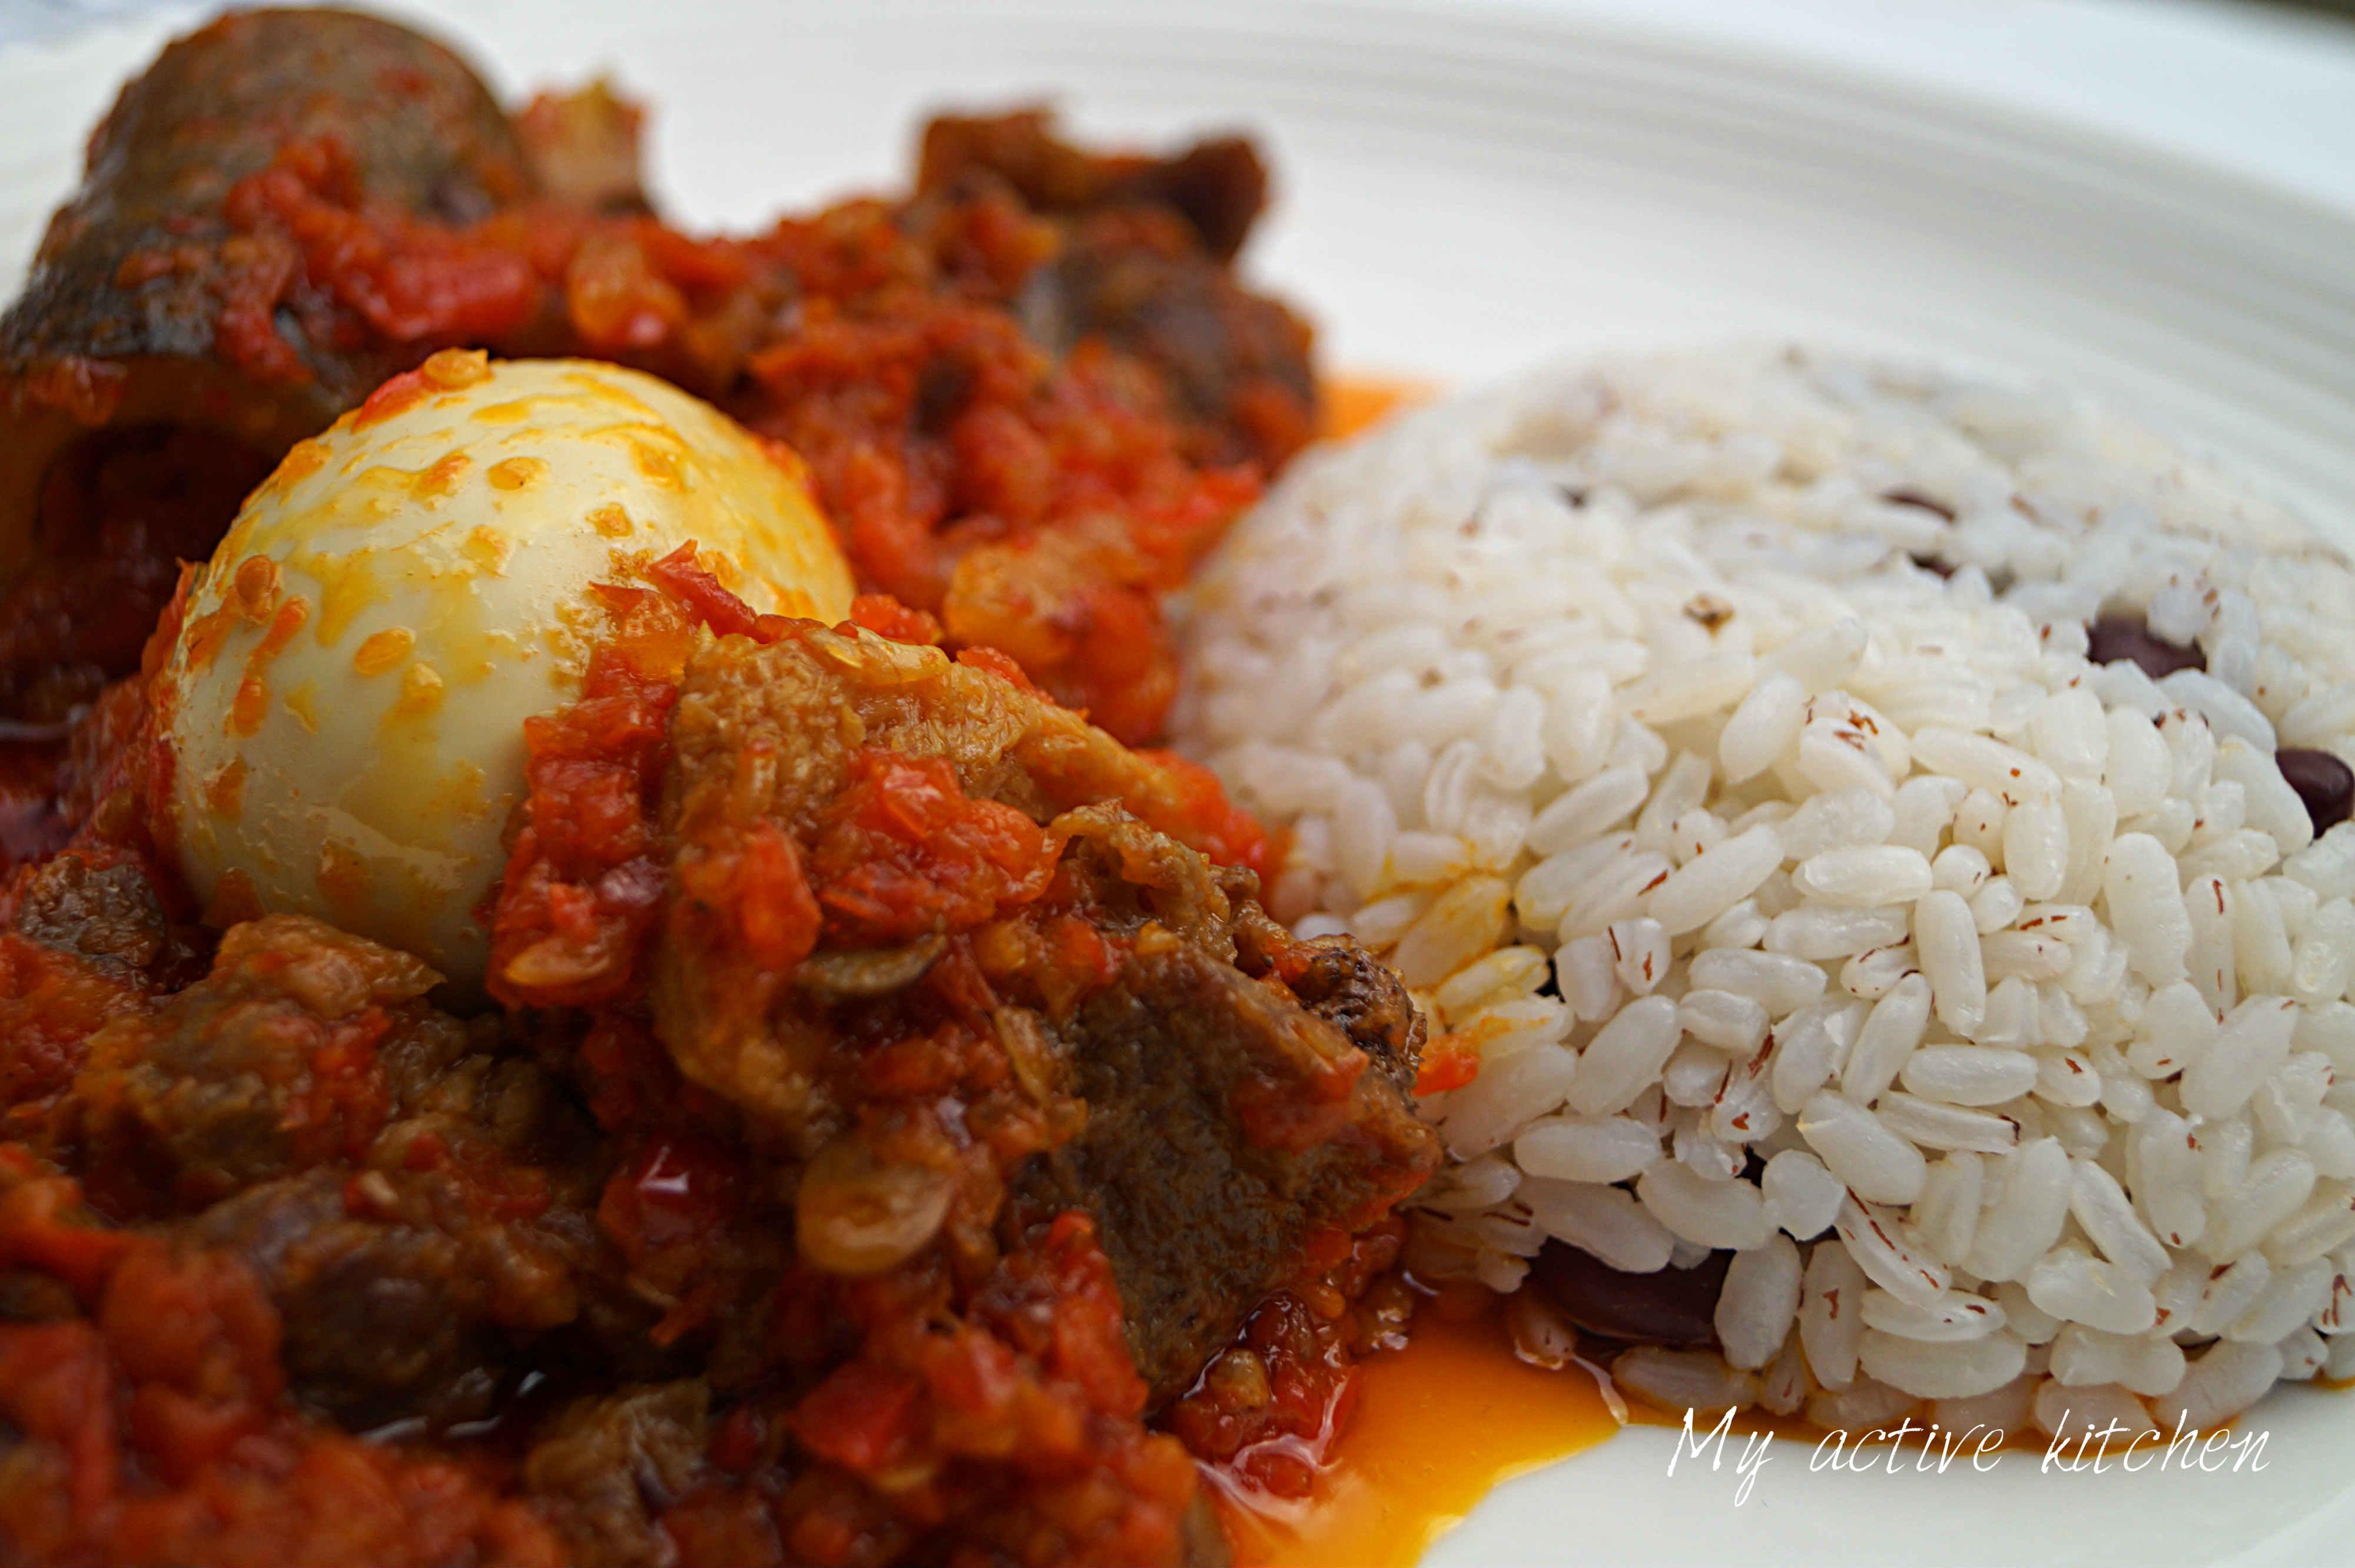 ofada rice and ofada stew on a plate